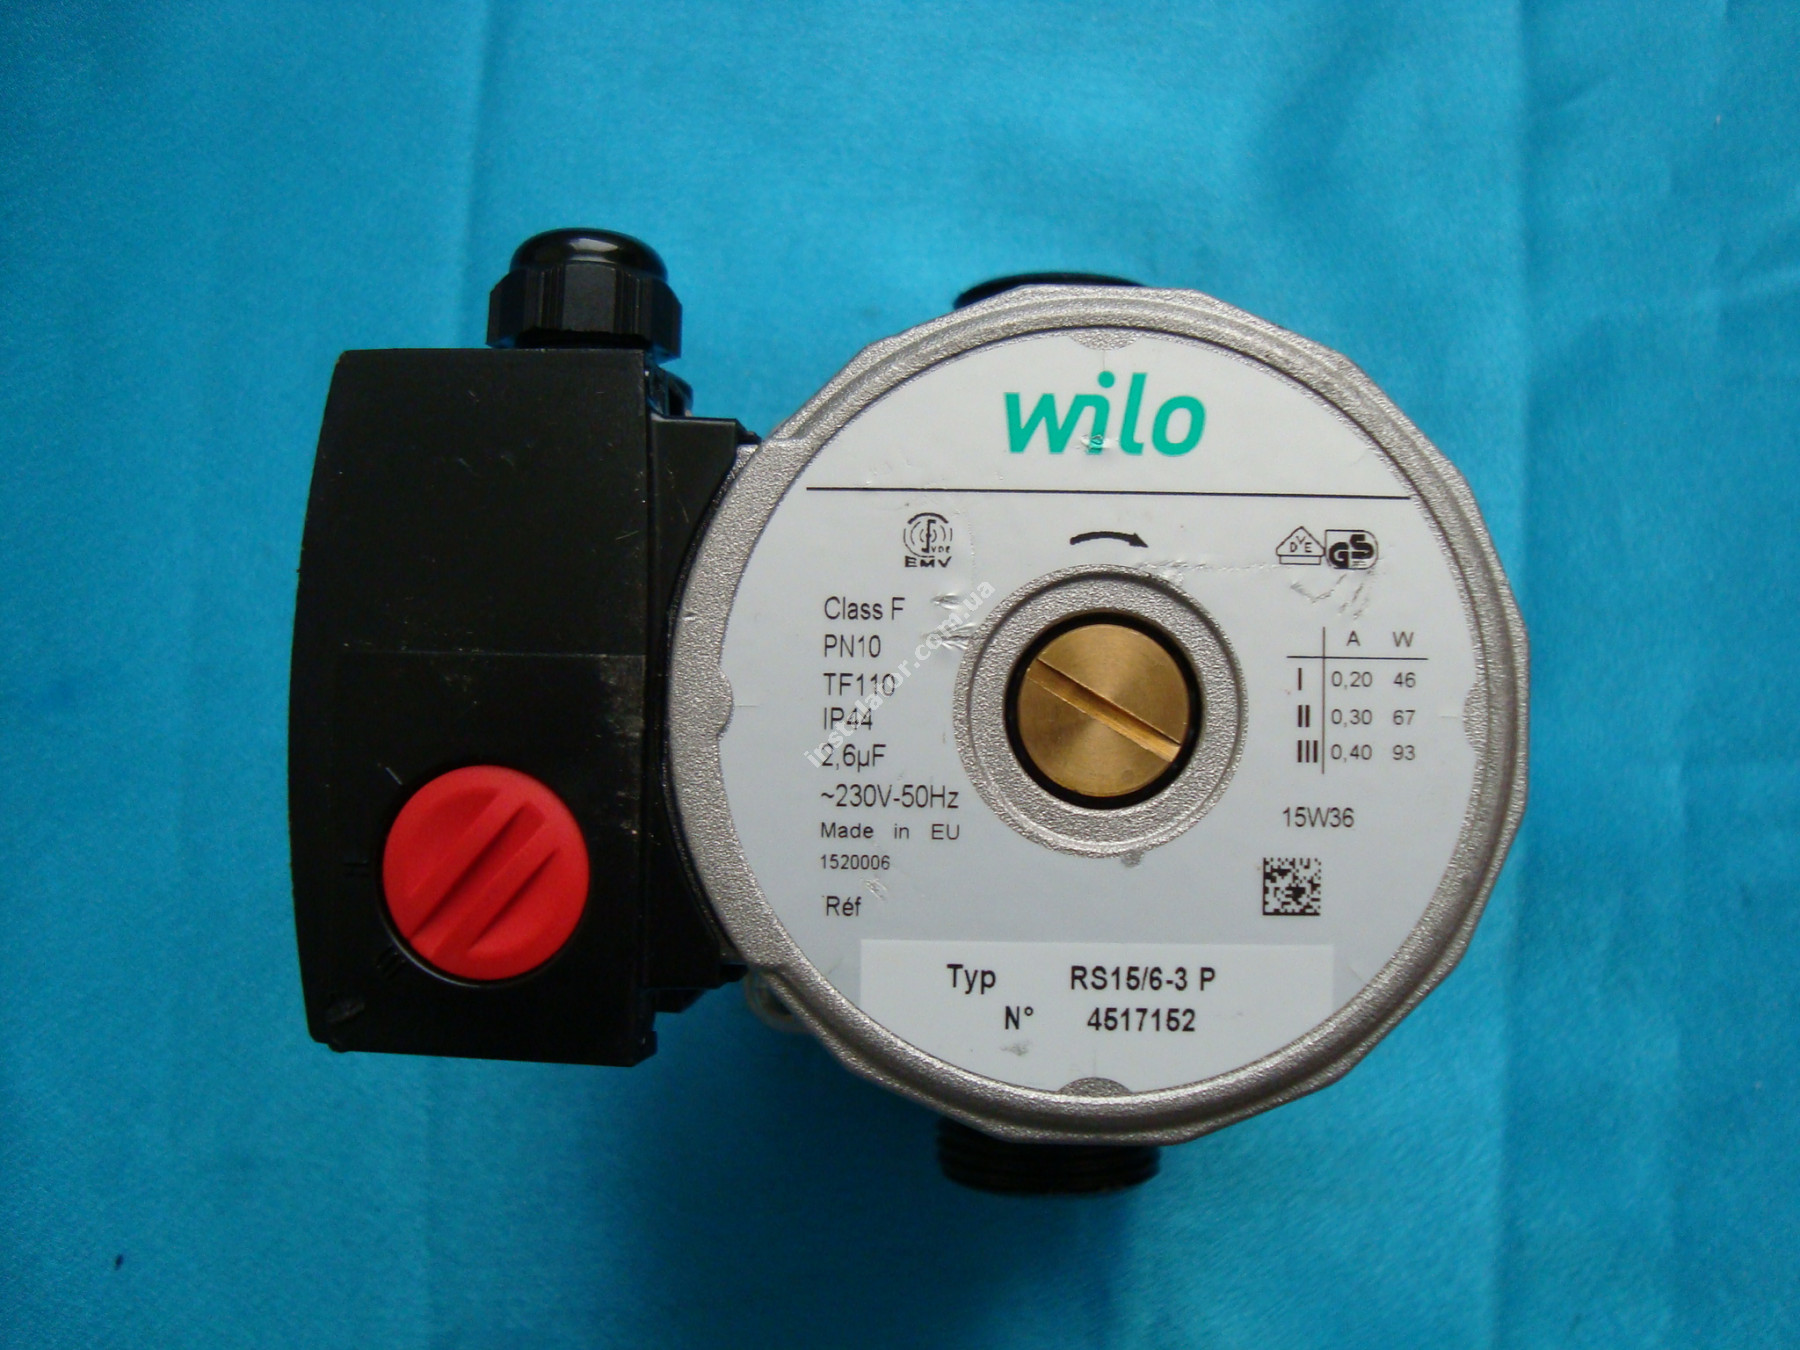 Циркуляційний насос Wilo RS 15/6 база 130 full-image-1